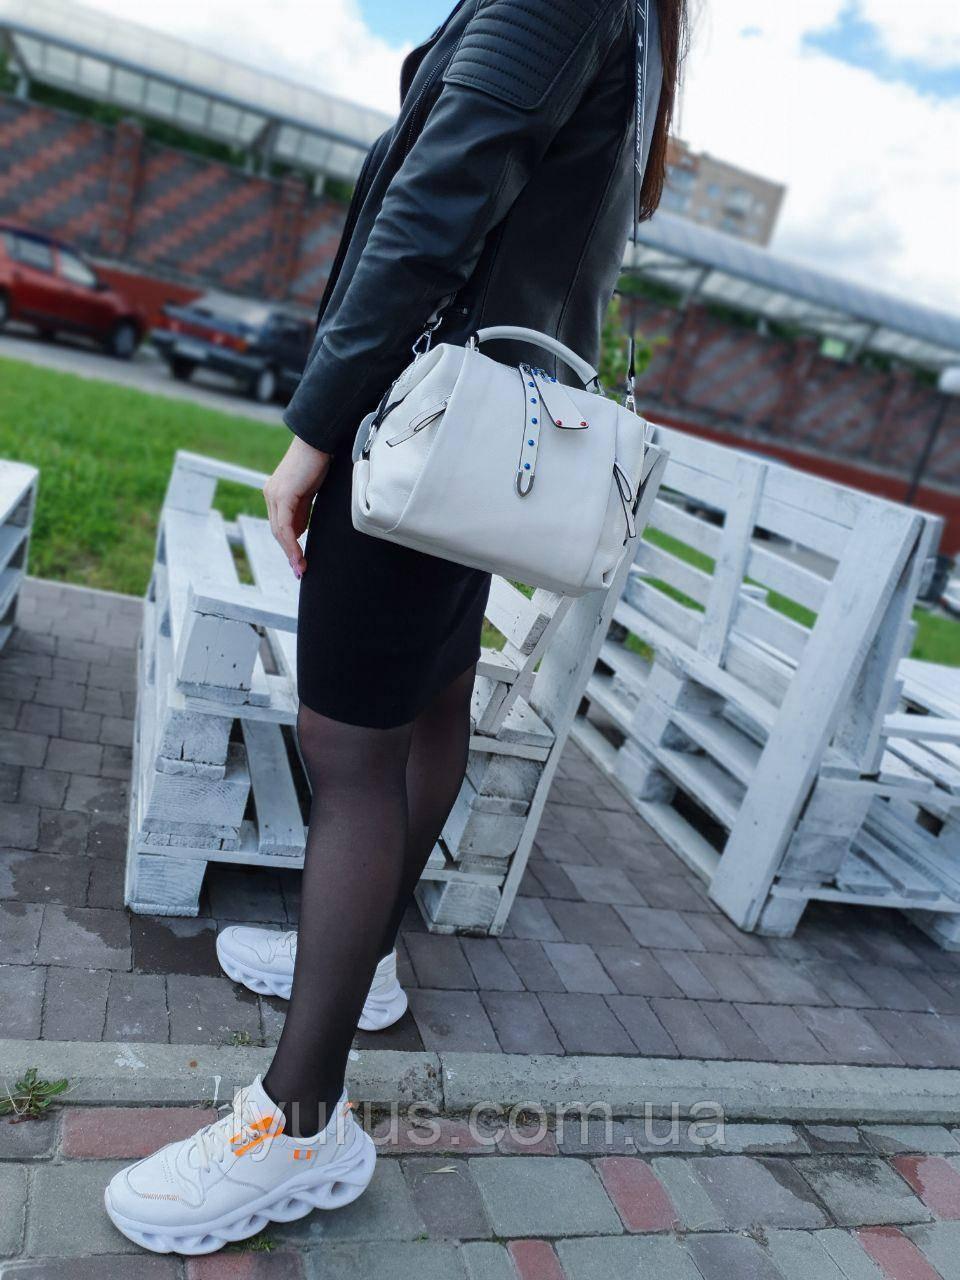 Женская кожаная сумка размером 26х20х13 см Белая (01221)